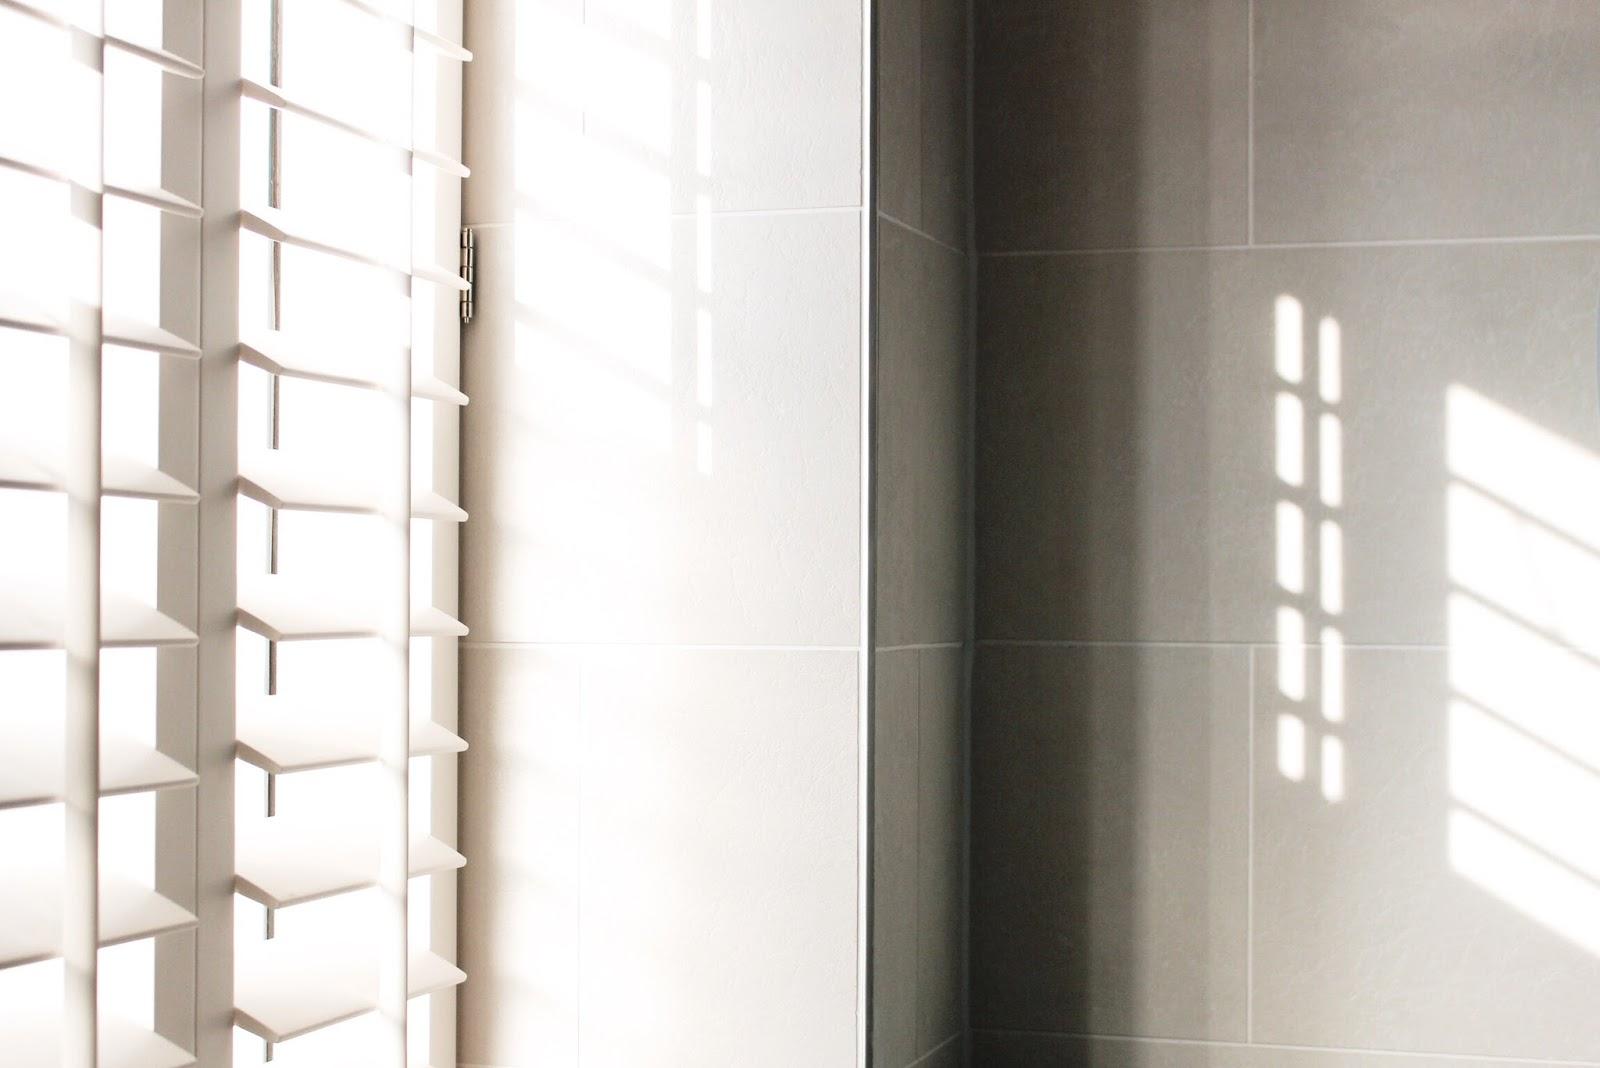 Morning Sunshine Coming Through Bathroom Blinds